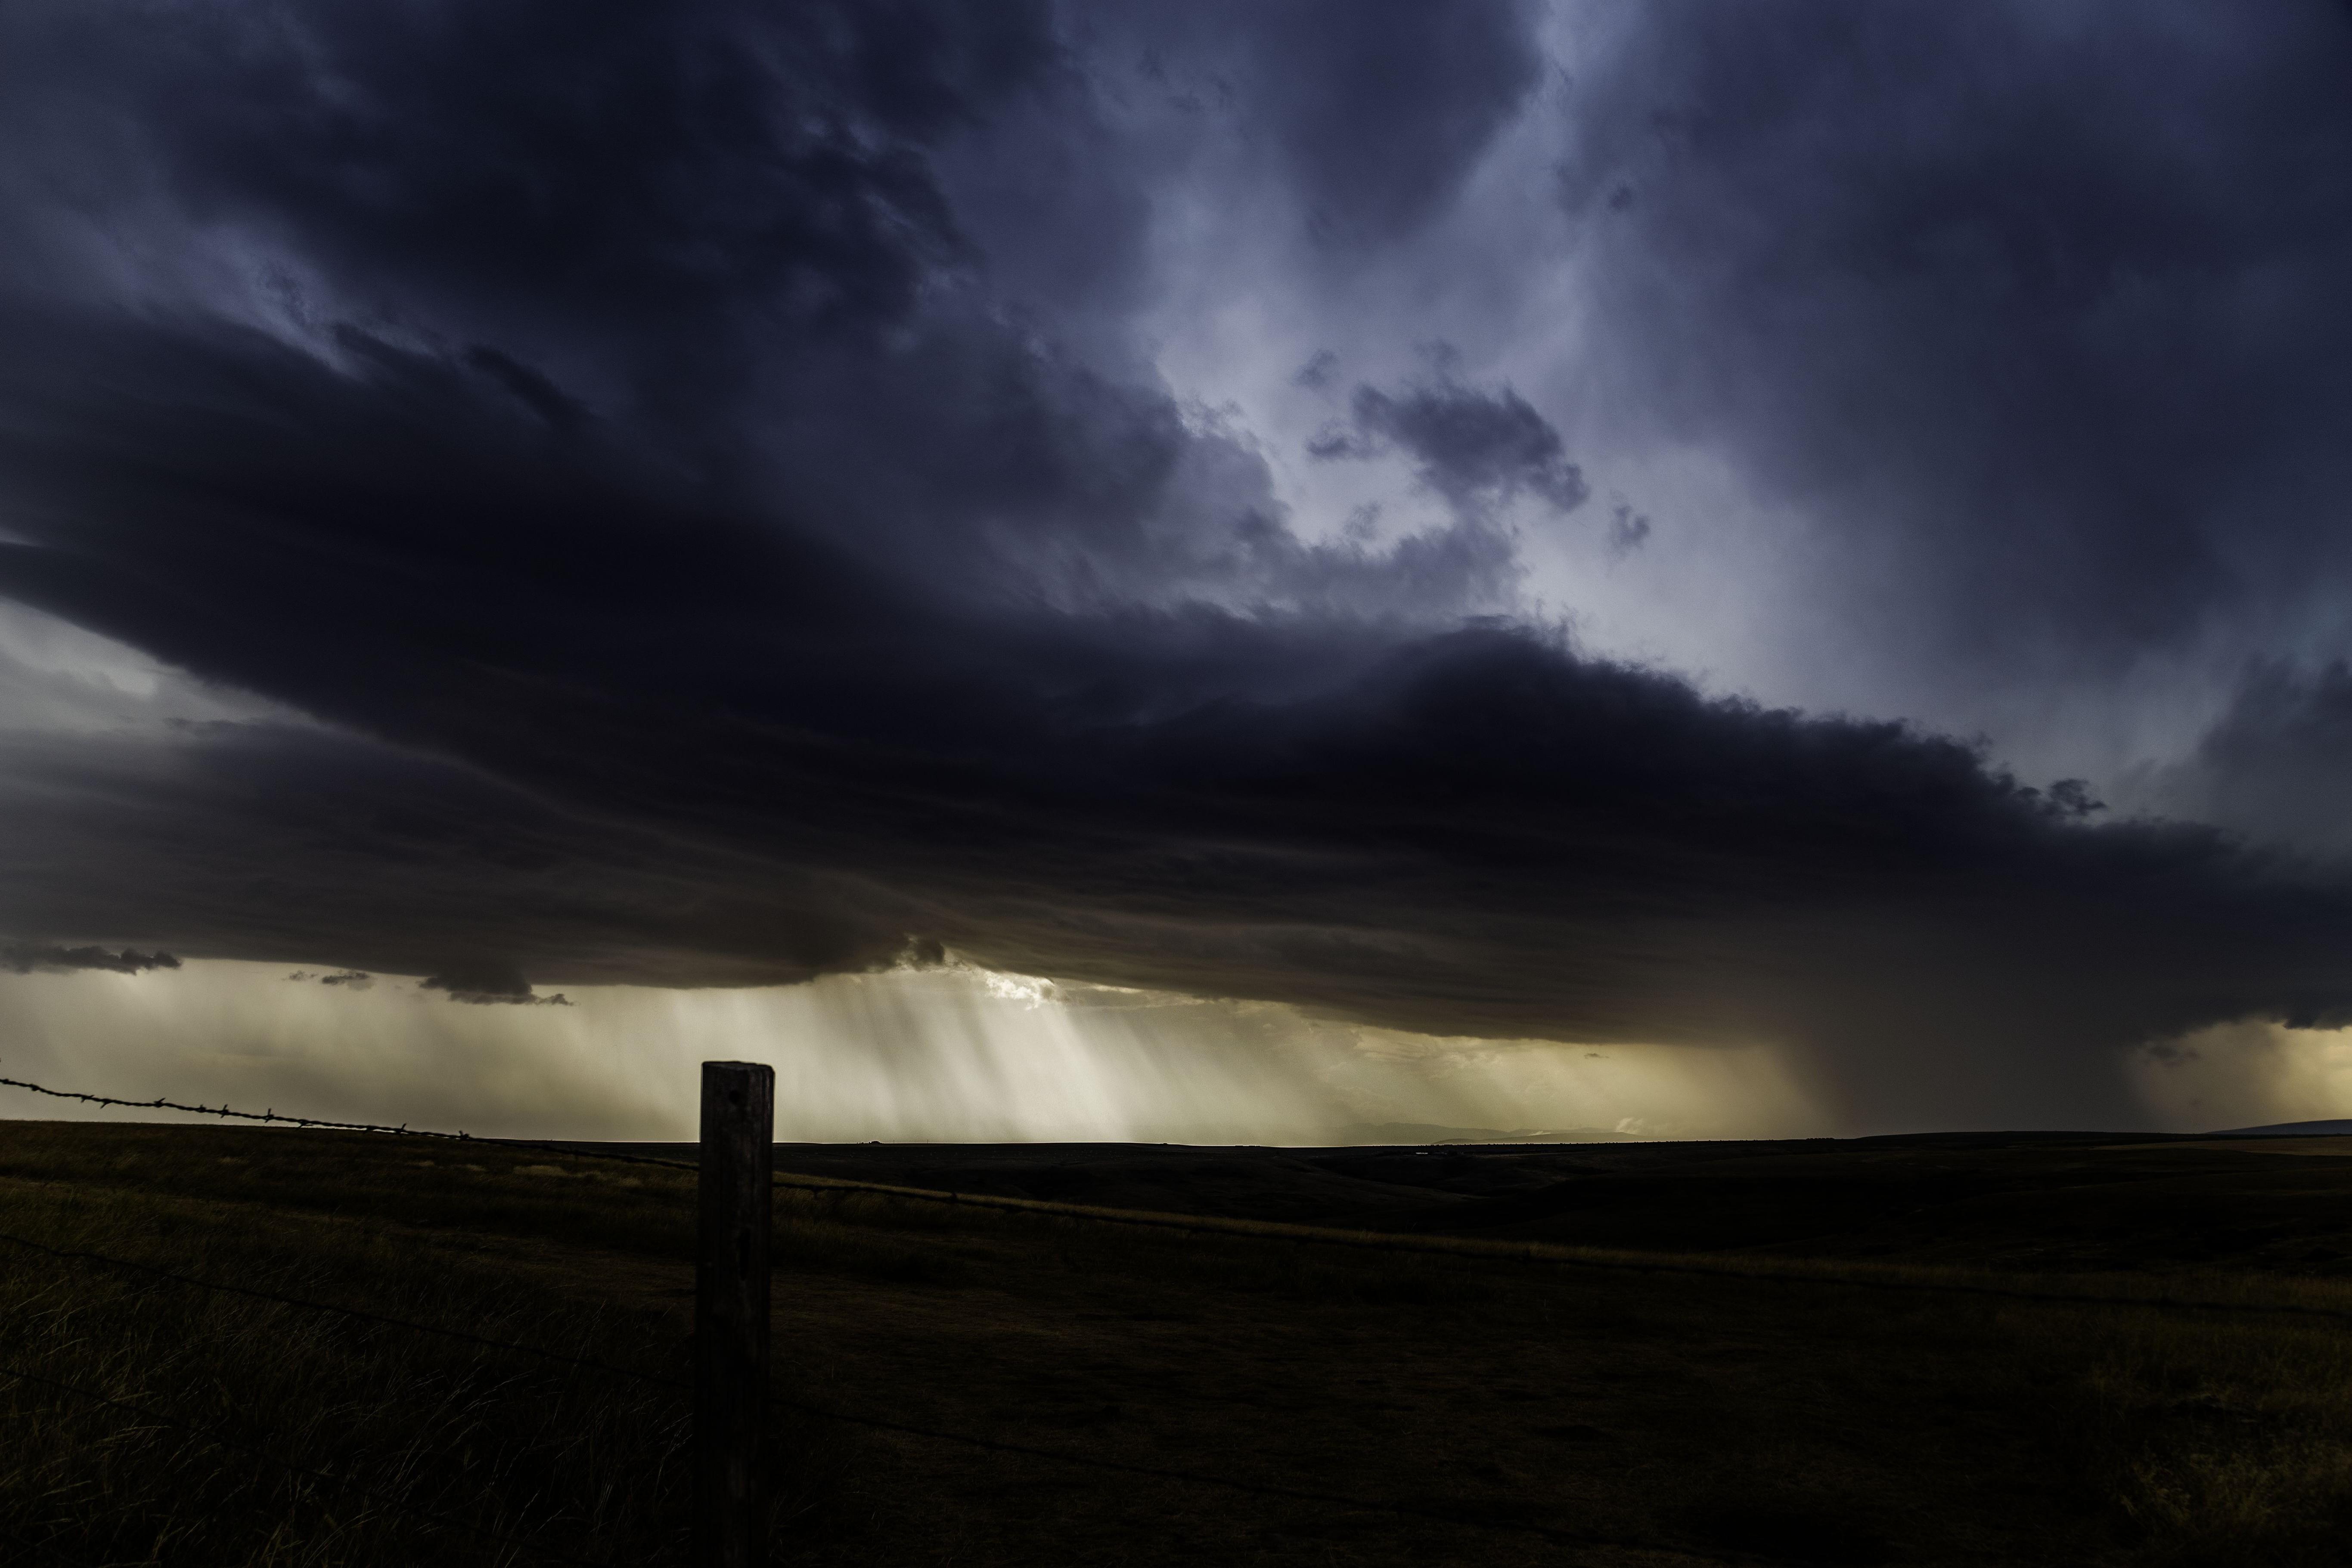 Photo Manipulation Storm Clouds Rain Nature Valley